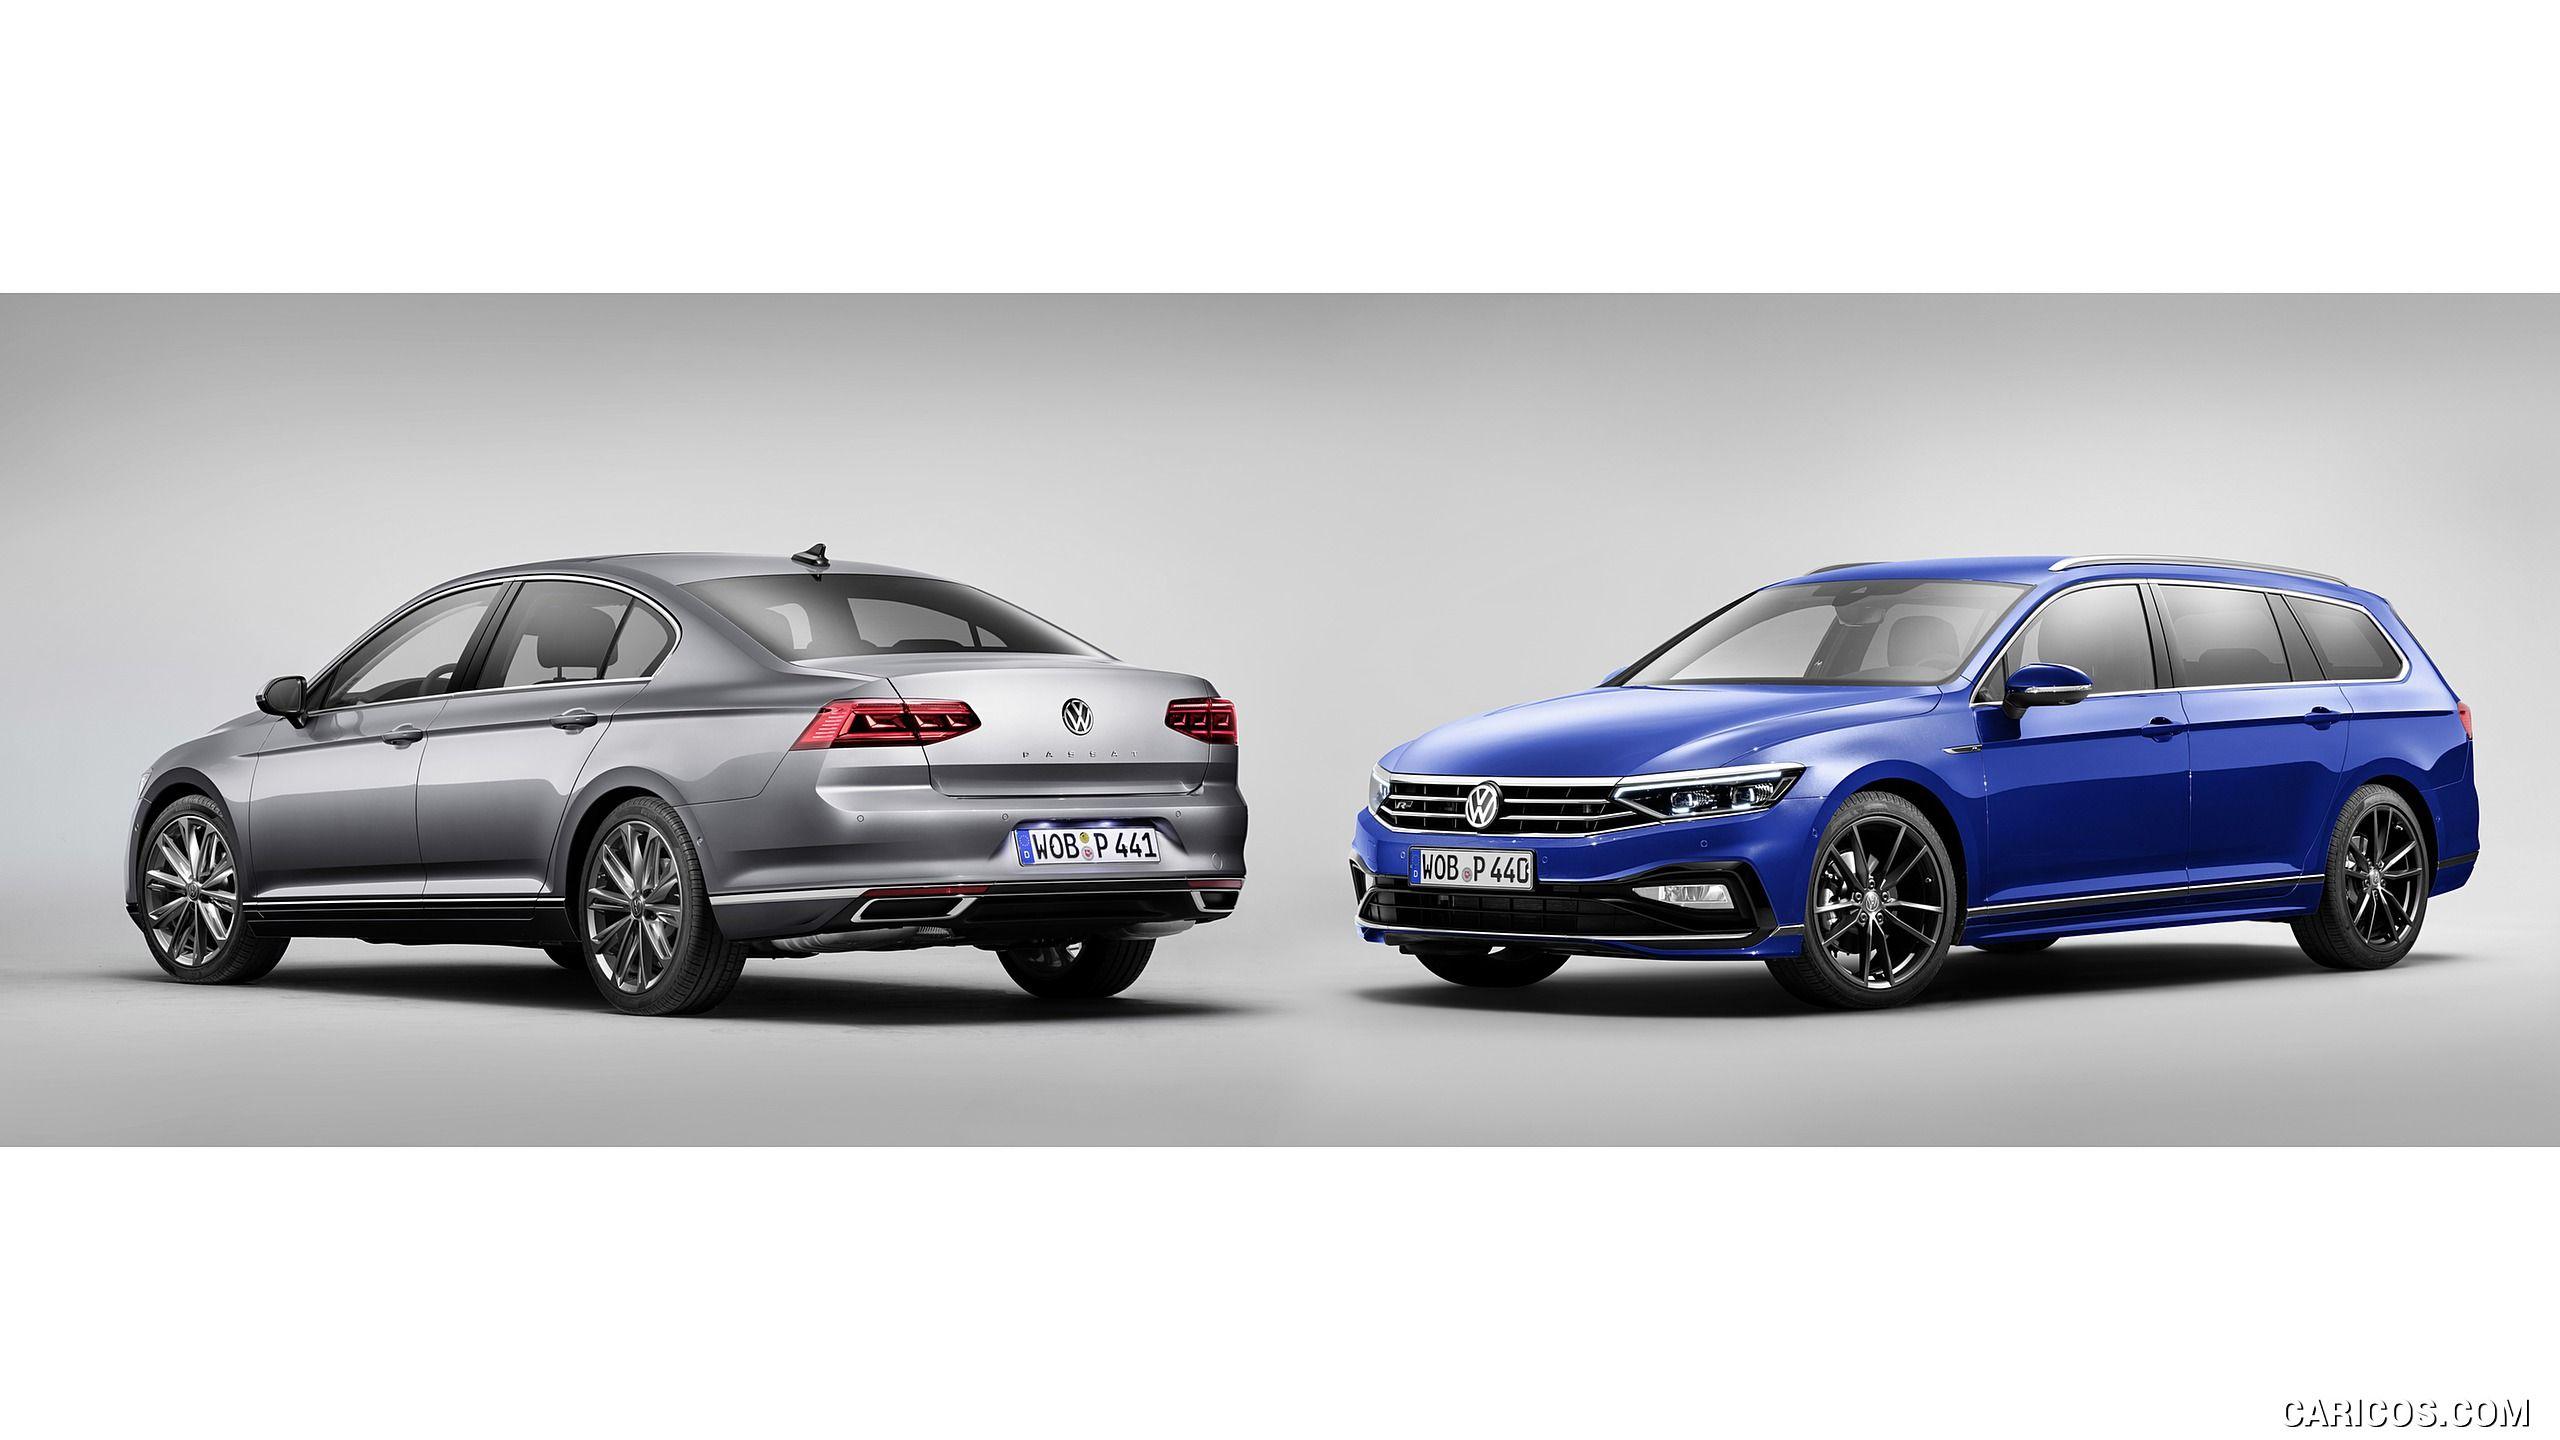 2020 Volkswagen Passat Sedan And Variant Eu Spec Hd Volkswagen Passat Car Volkswagen Volkswagen